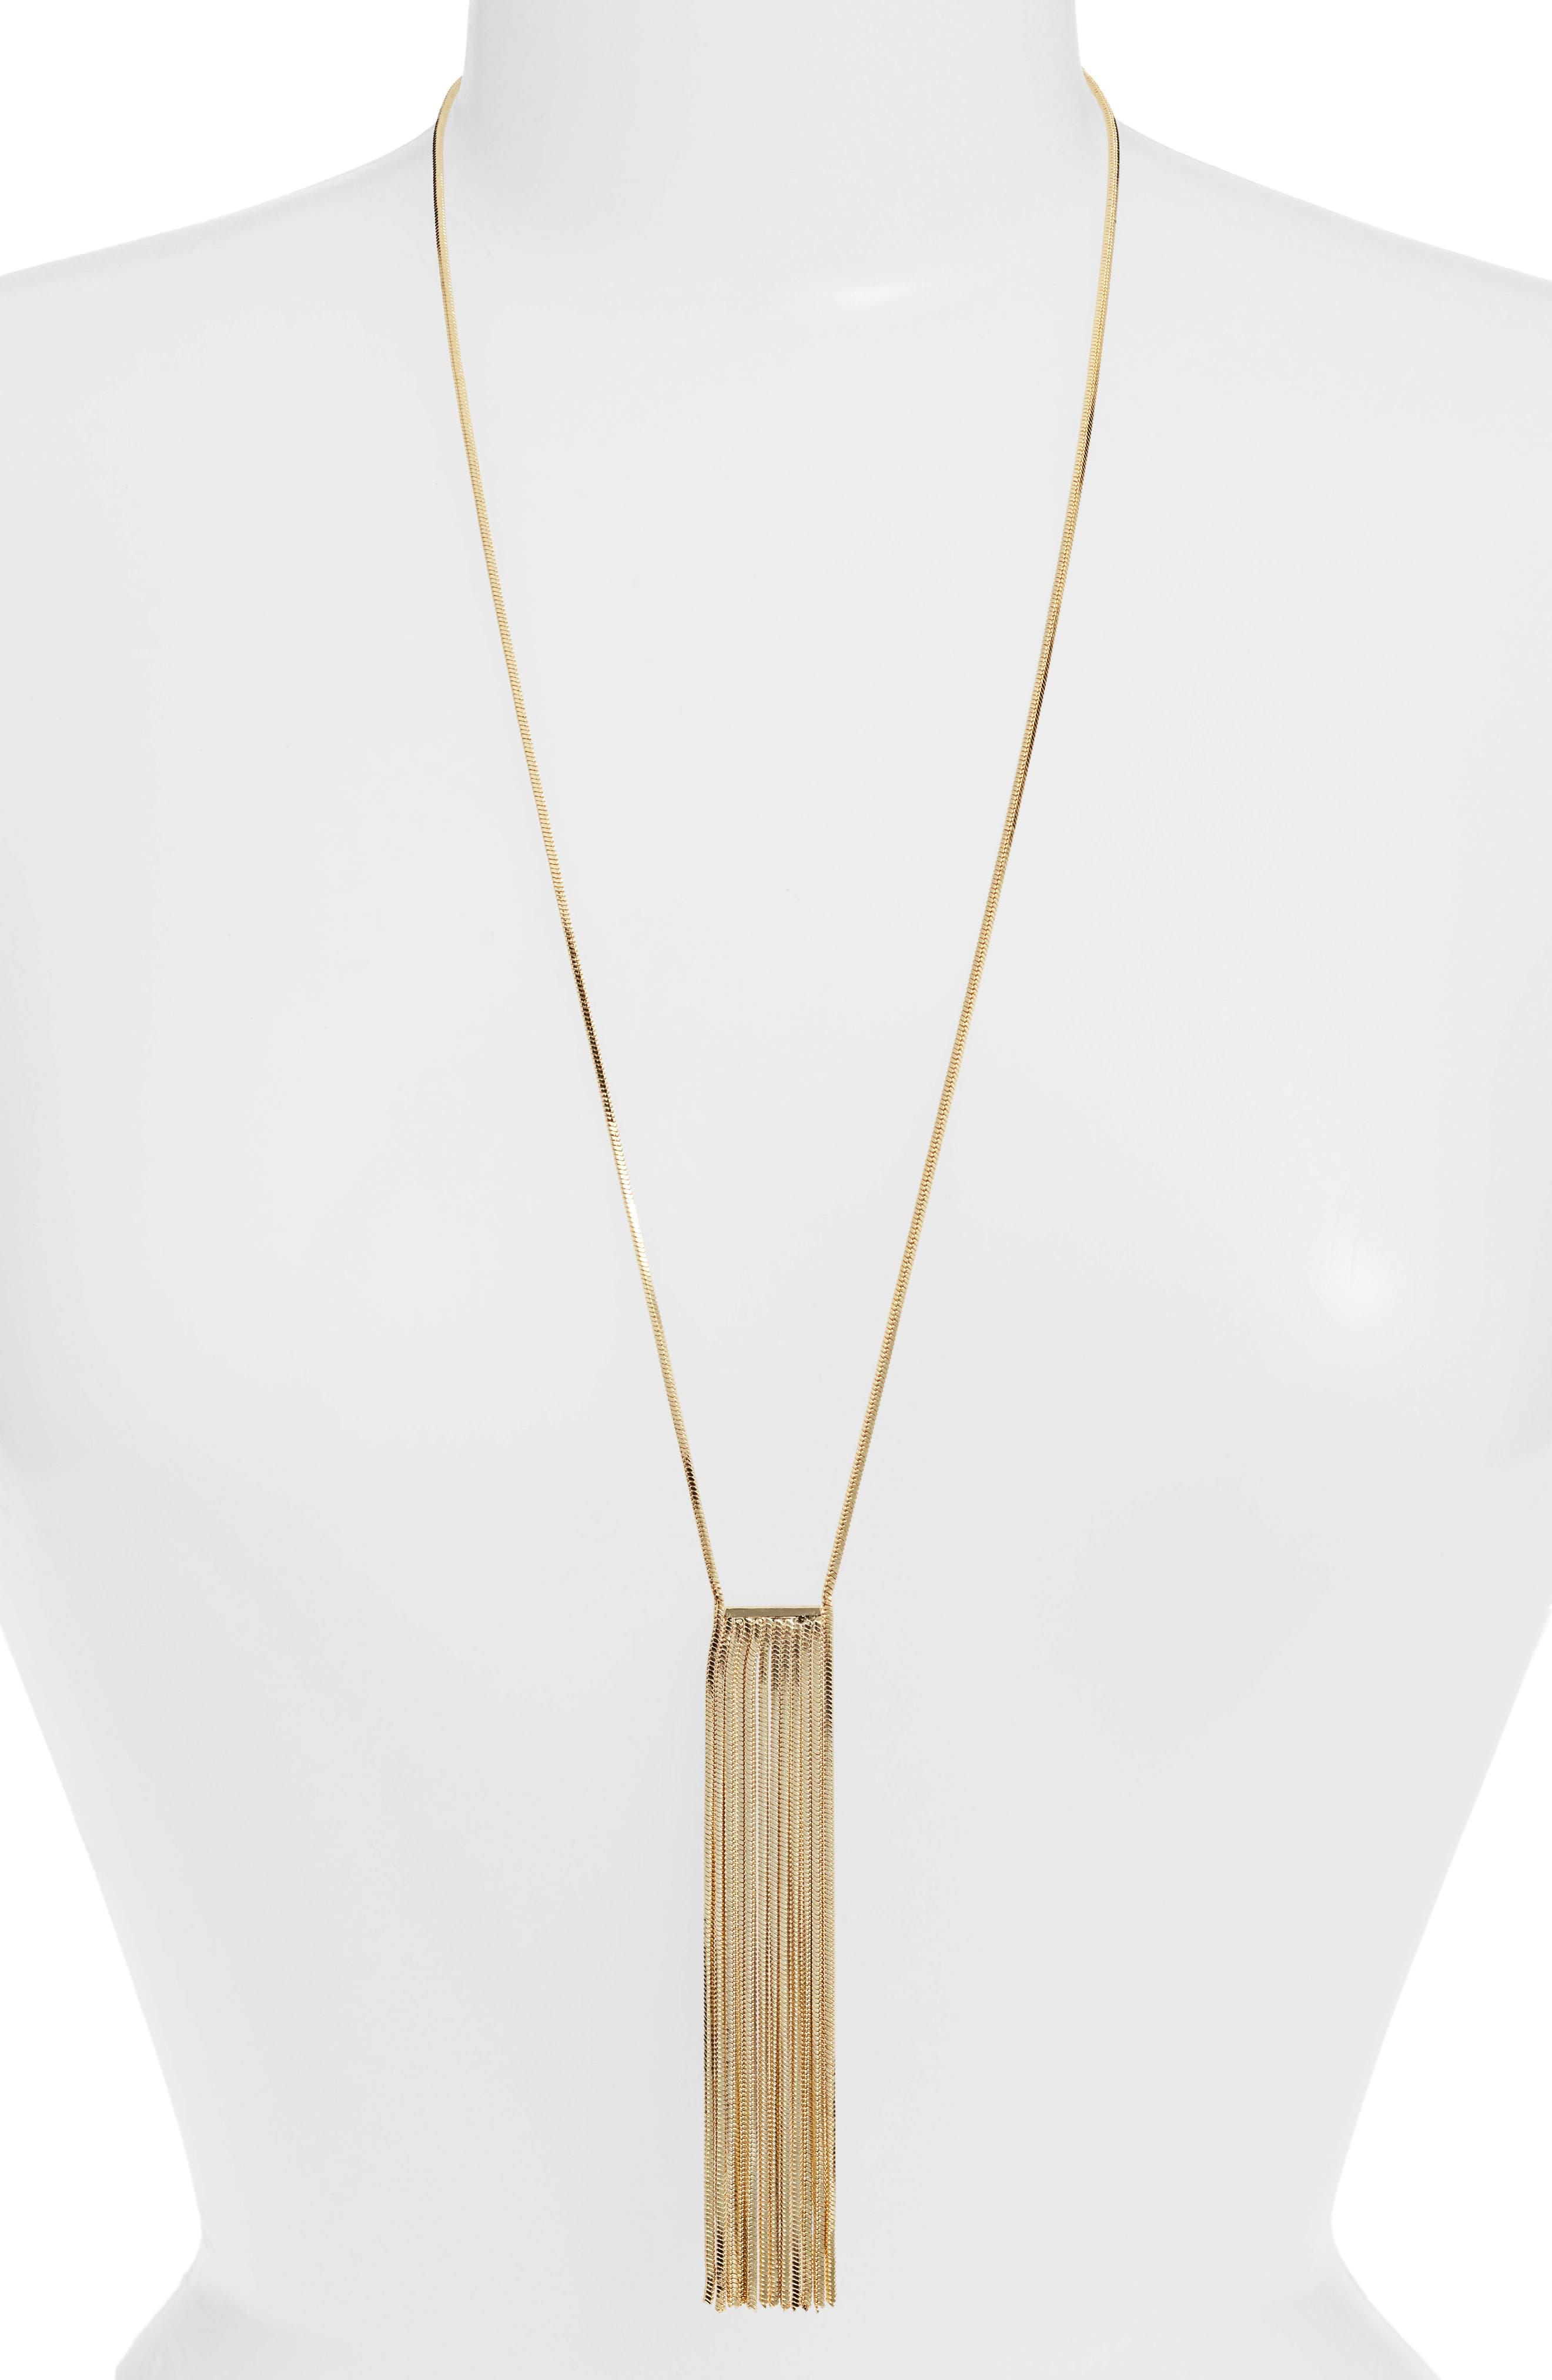 MELINDA MARIA Fringe Necklace in Gold